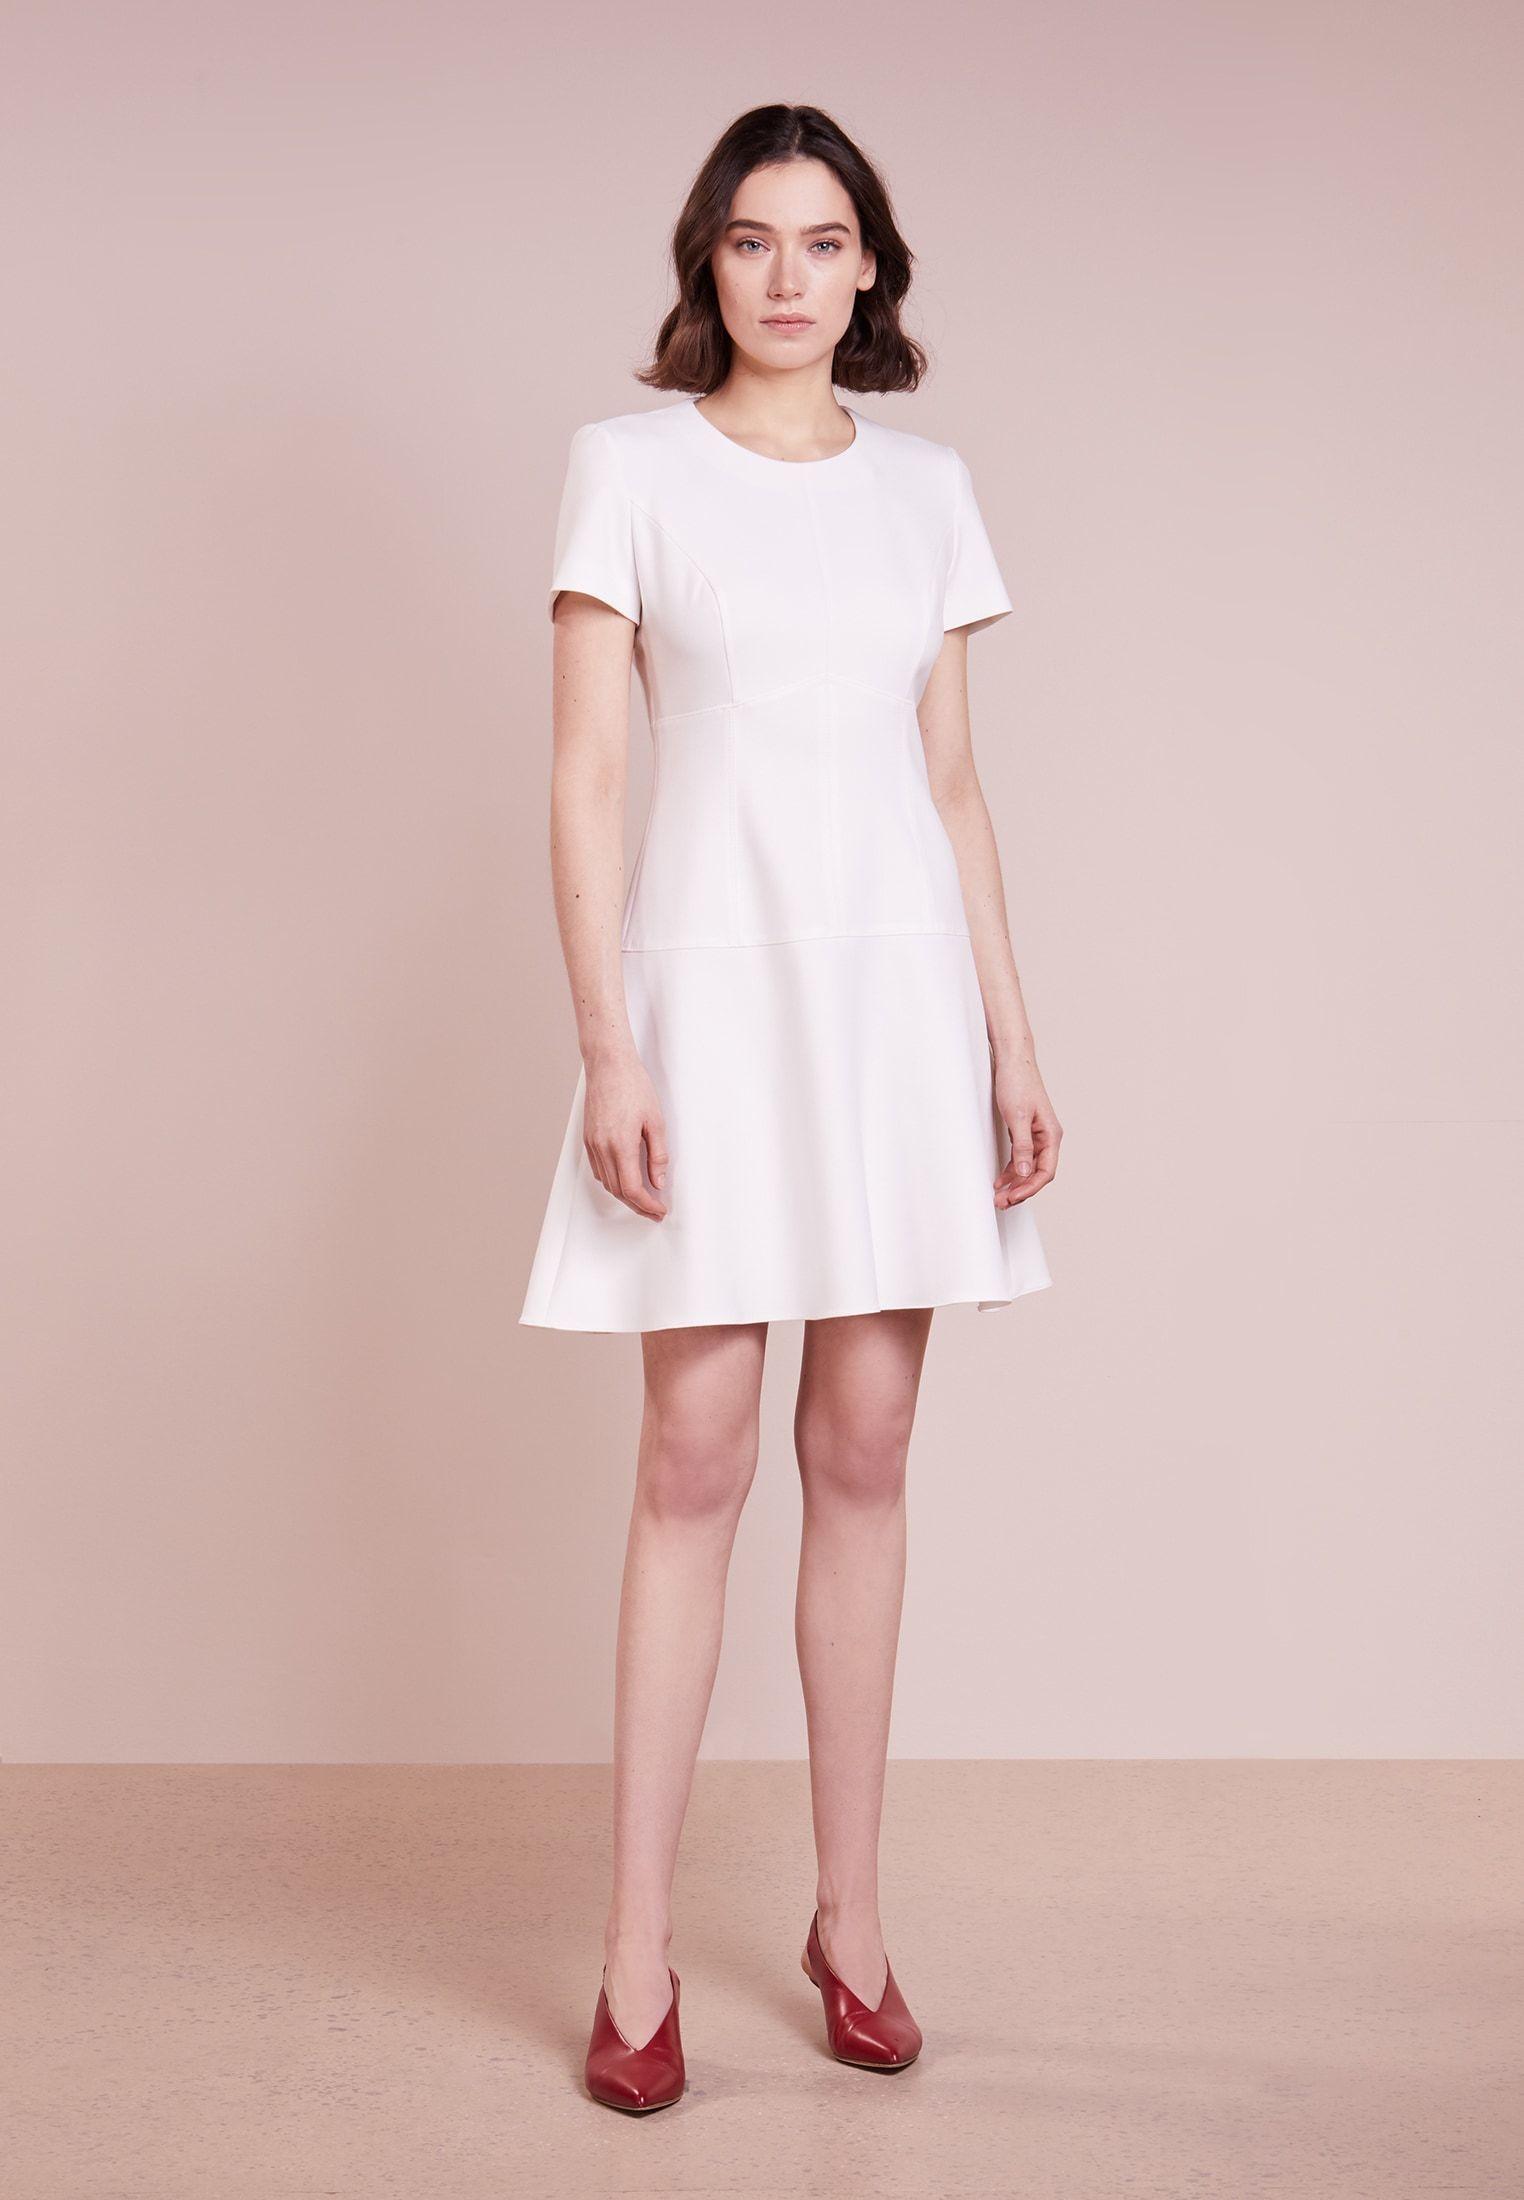 Asombroso Vestido De Cóctel De Sears Ideas Ornamento Elaboración ...